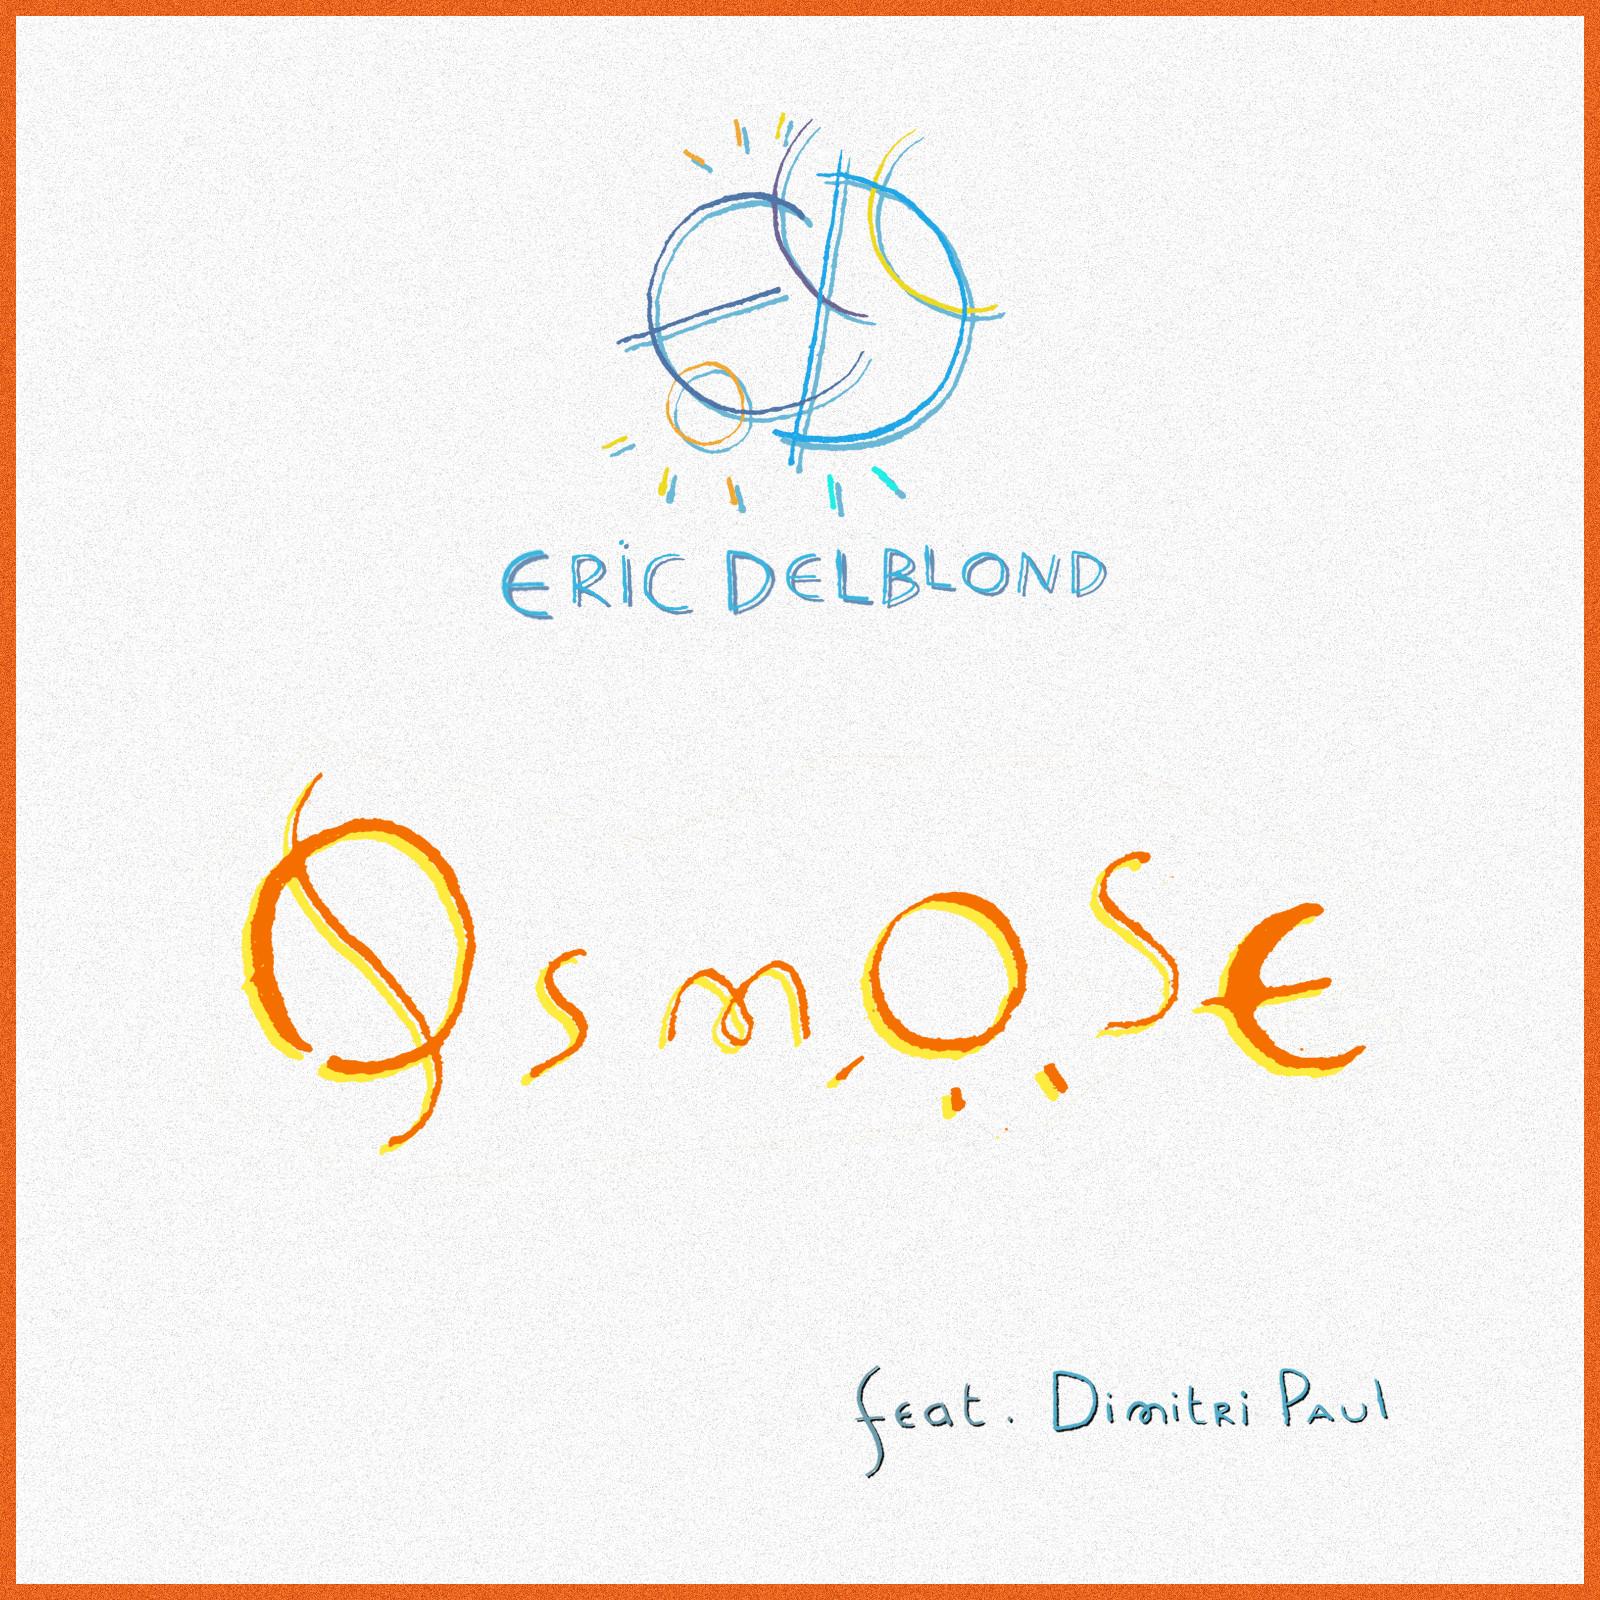 ED_Osmose_11.jpg